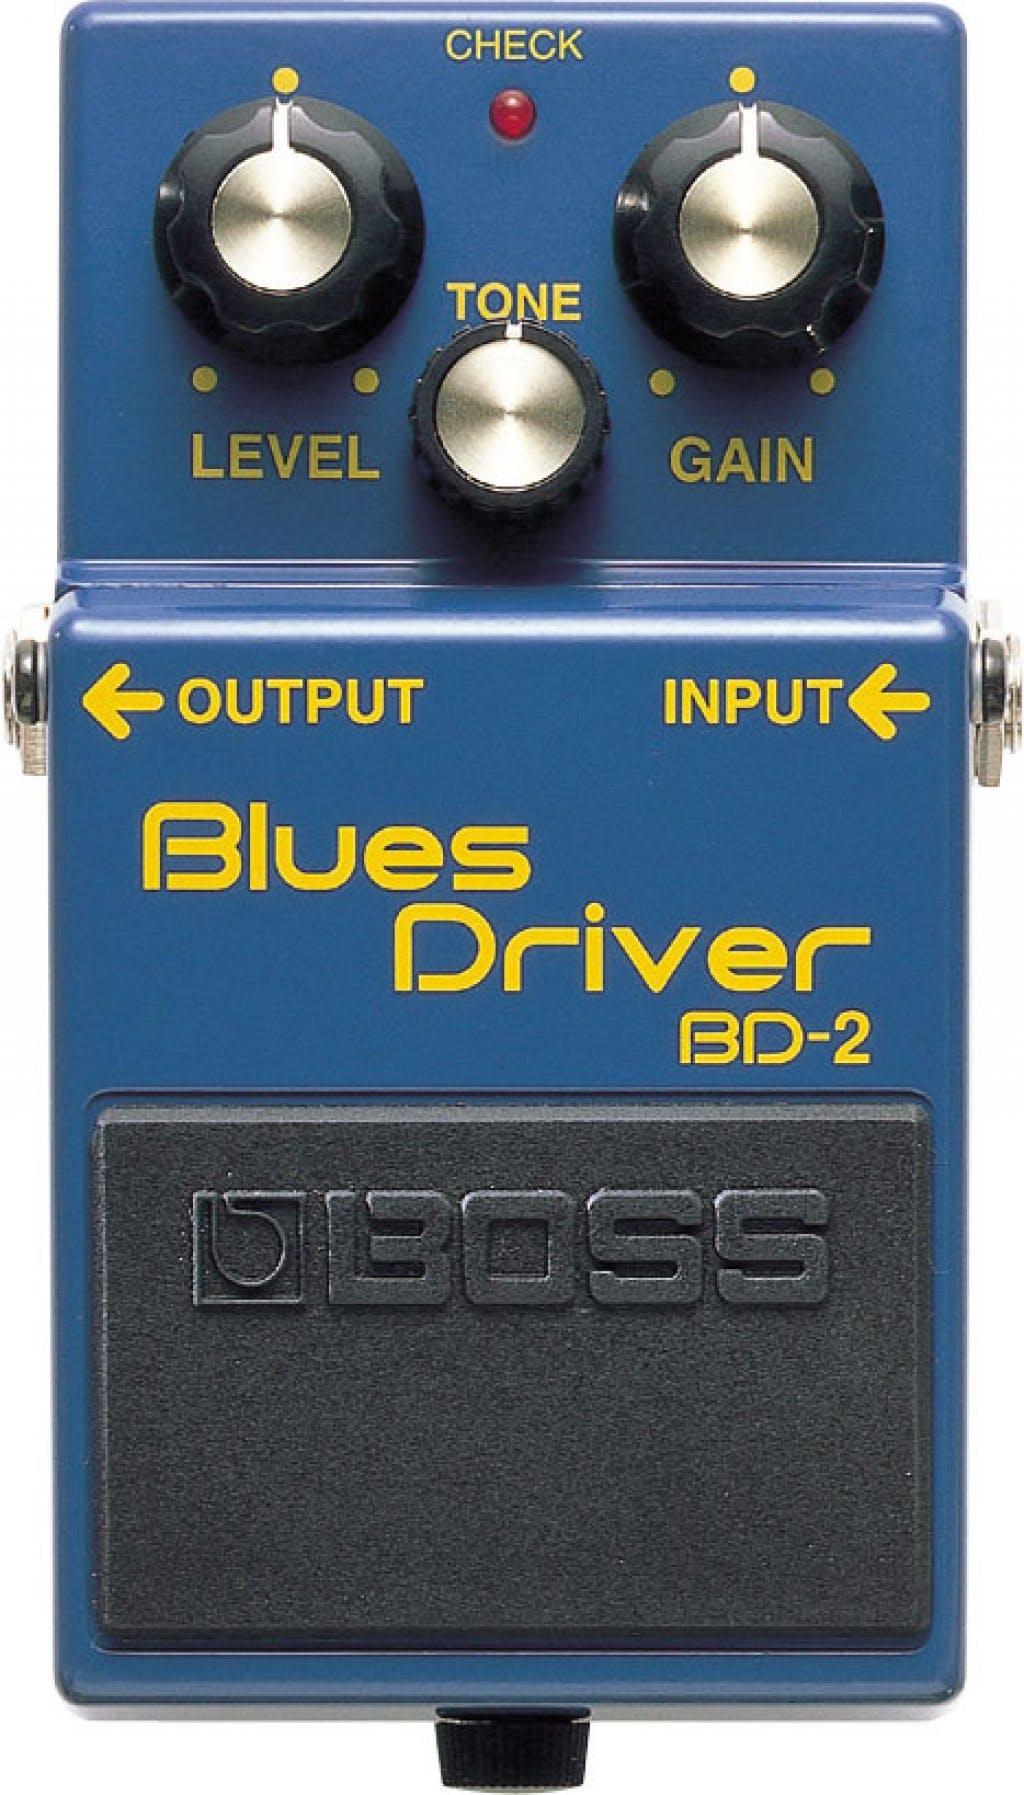 MARSHALL BLUESBREAKER VS BOSS BLUES DRIVER DOWNLOAD